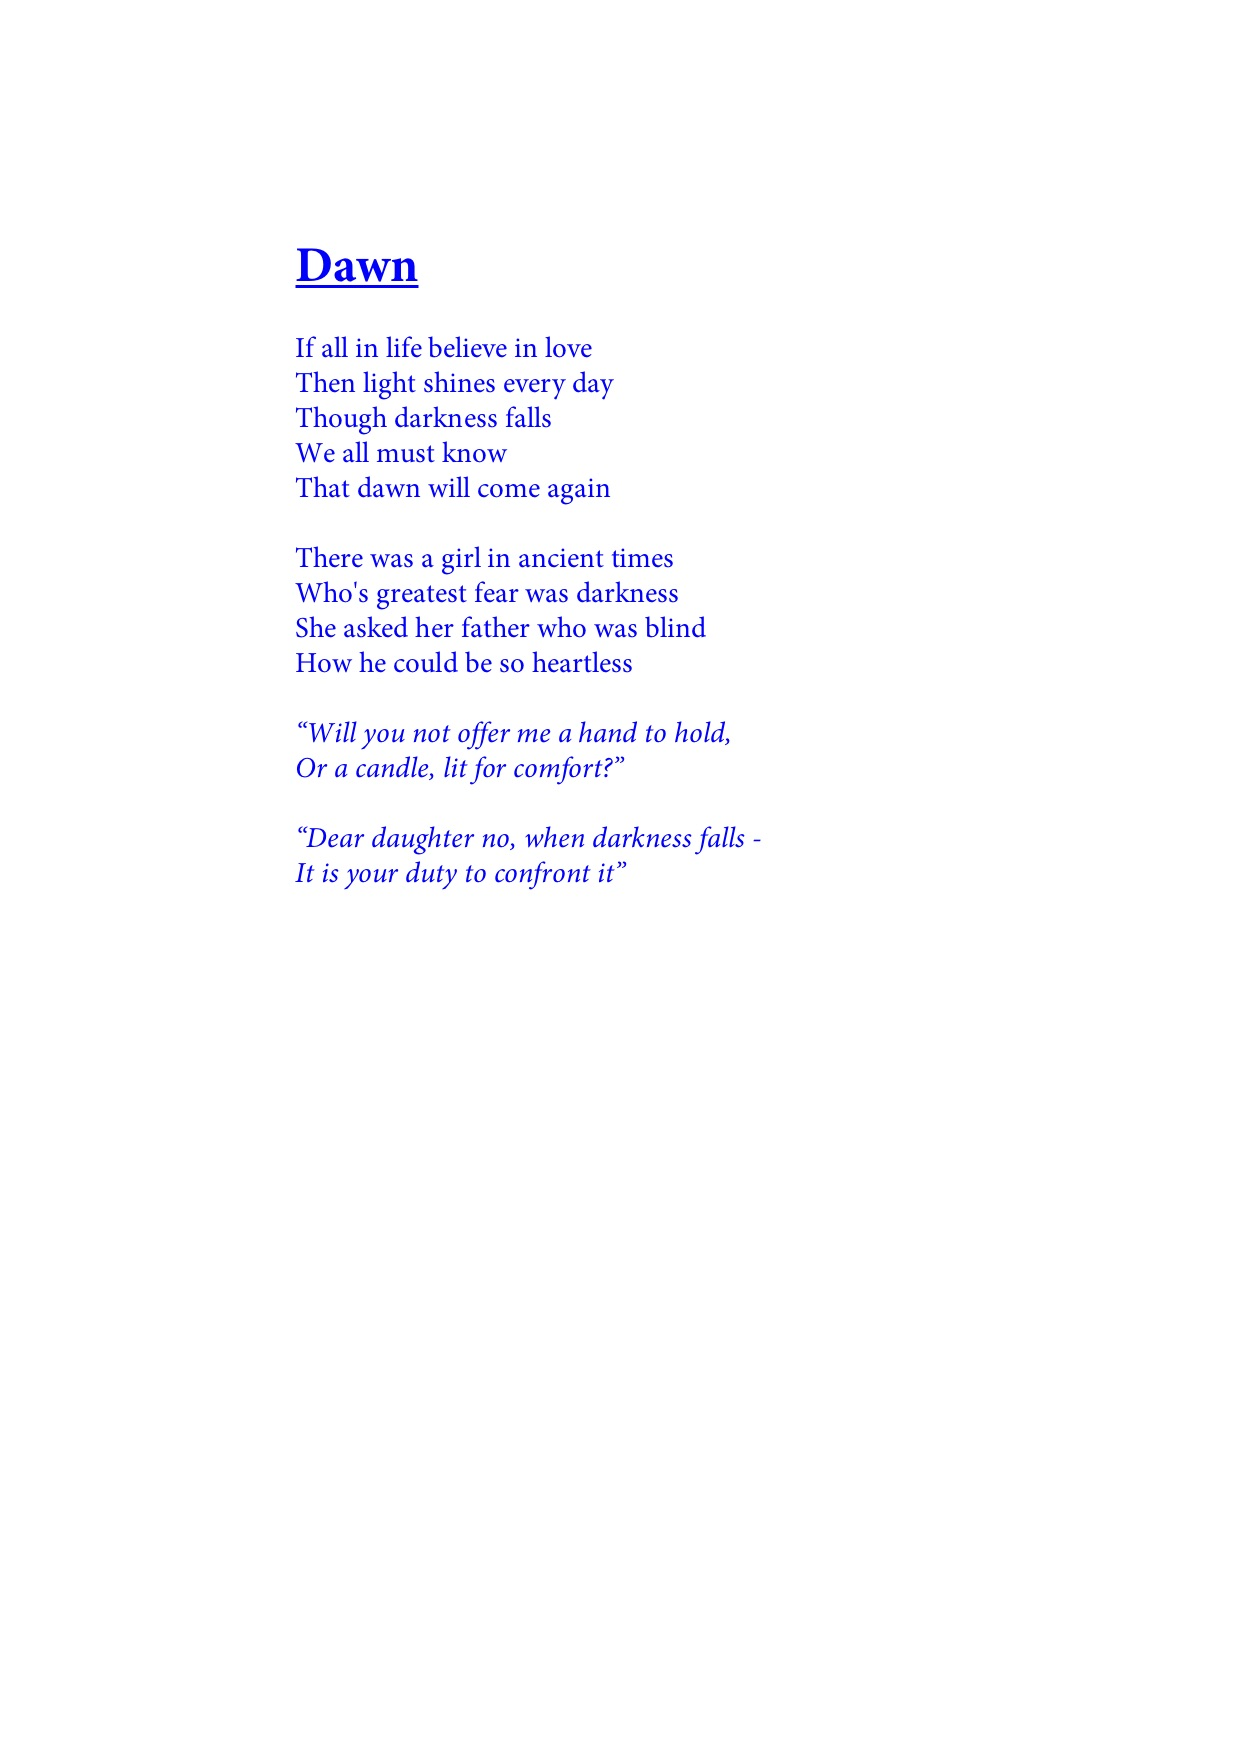 Modern Romantic Poetry (A6)7.jpg